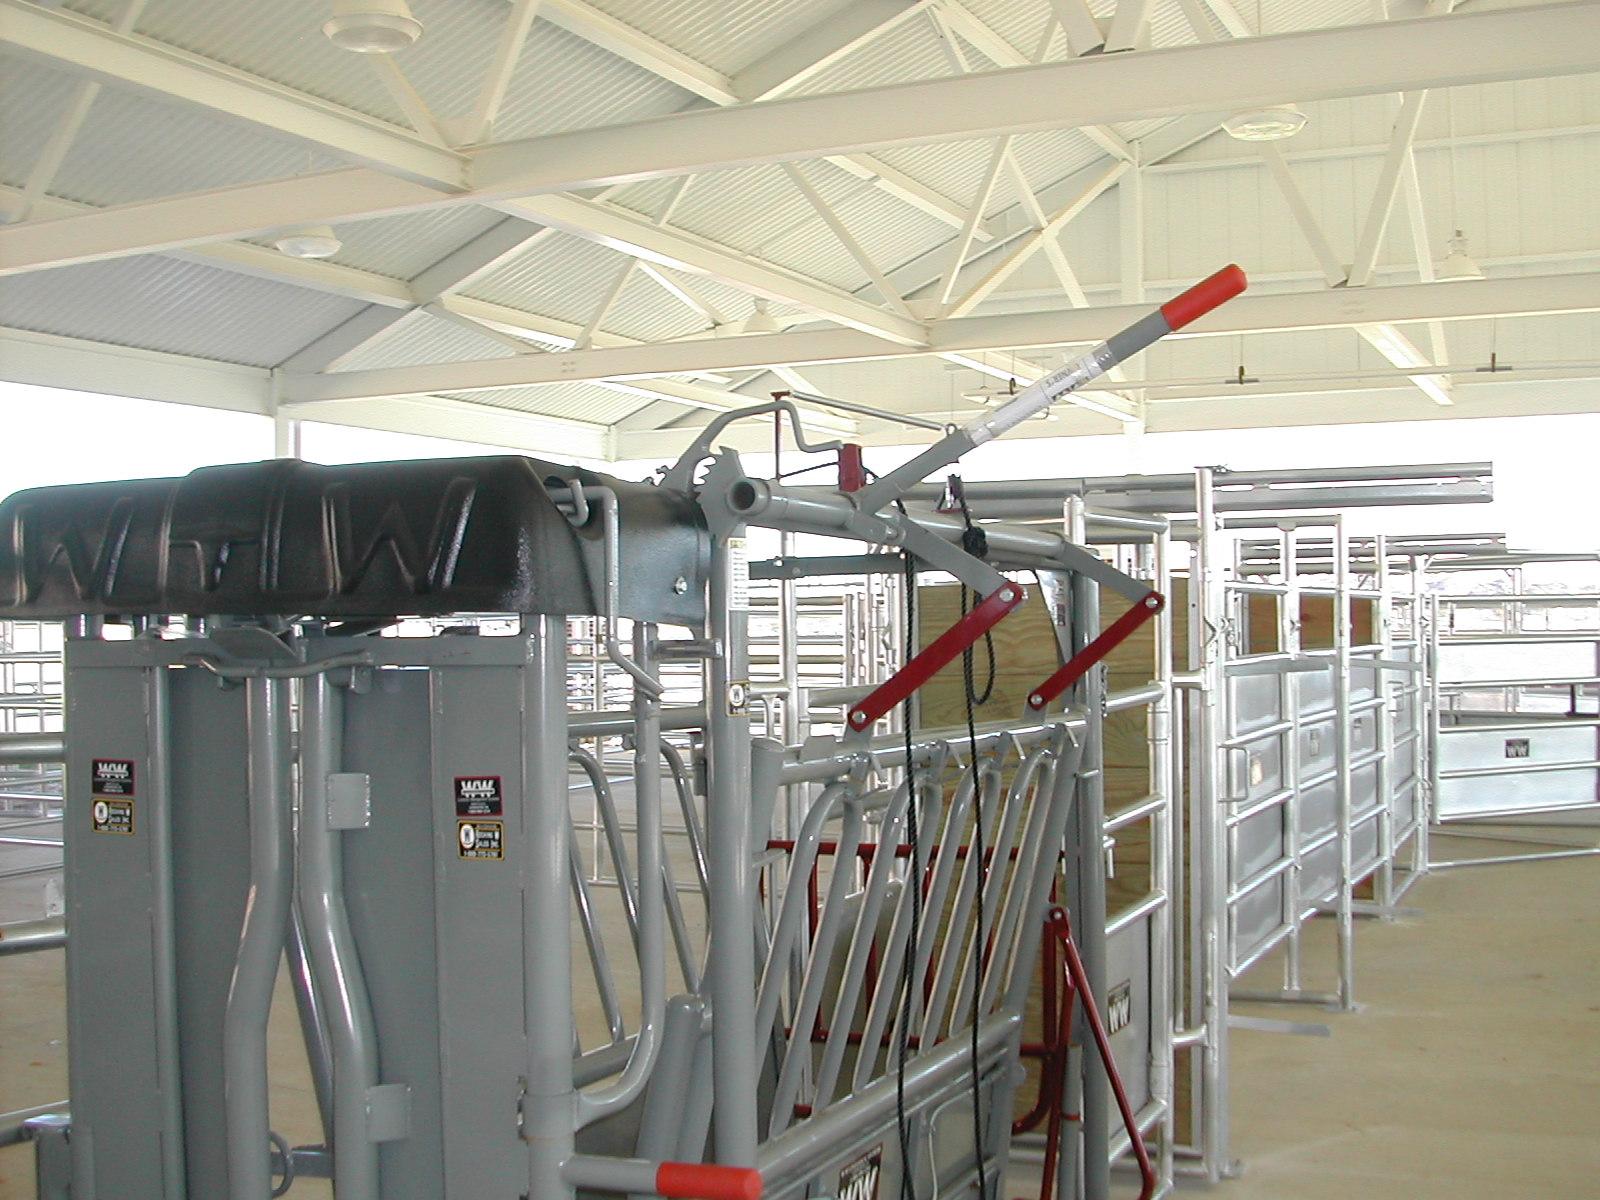 auburn university meats laboratory construction project 2.JPG